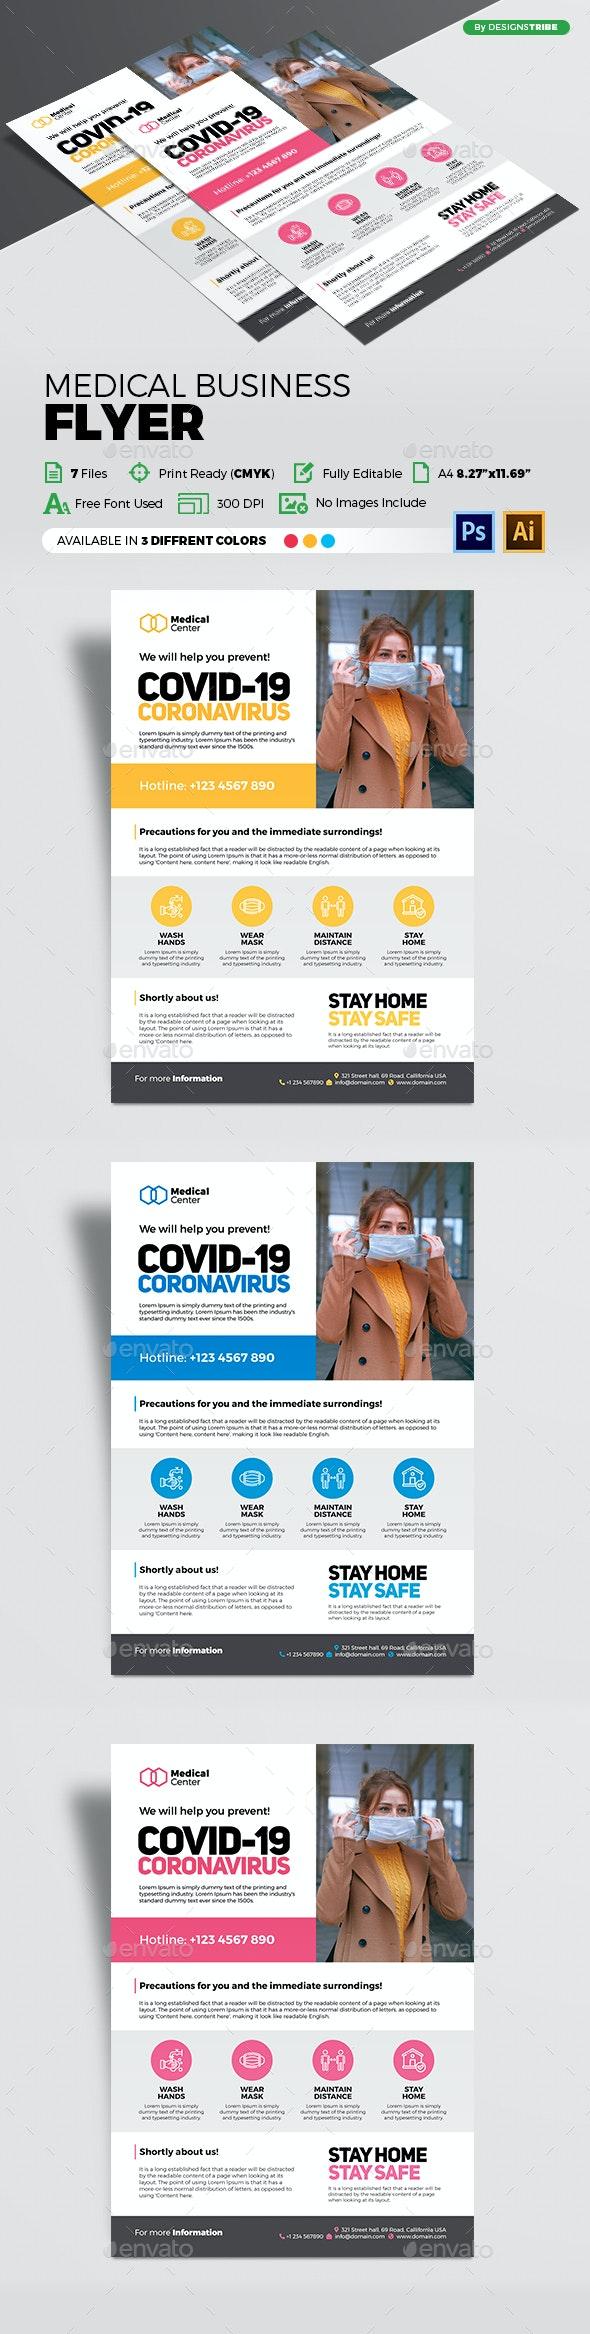 Medical Business Flyer - Flyers Print Templates